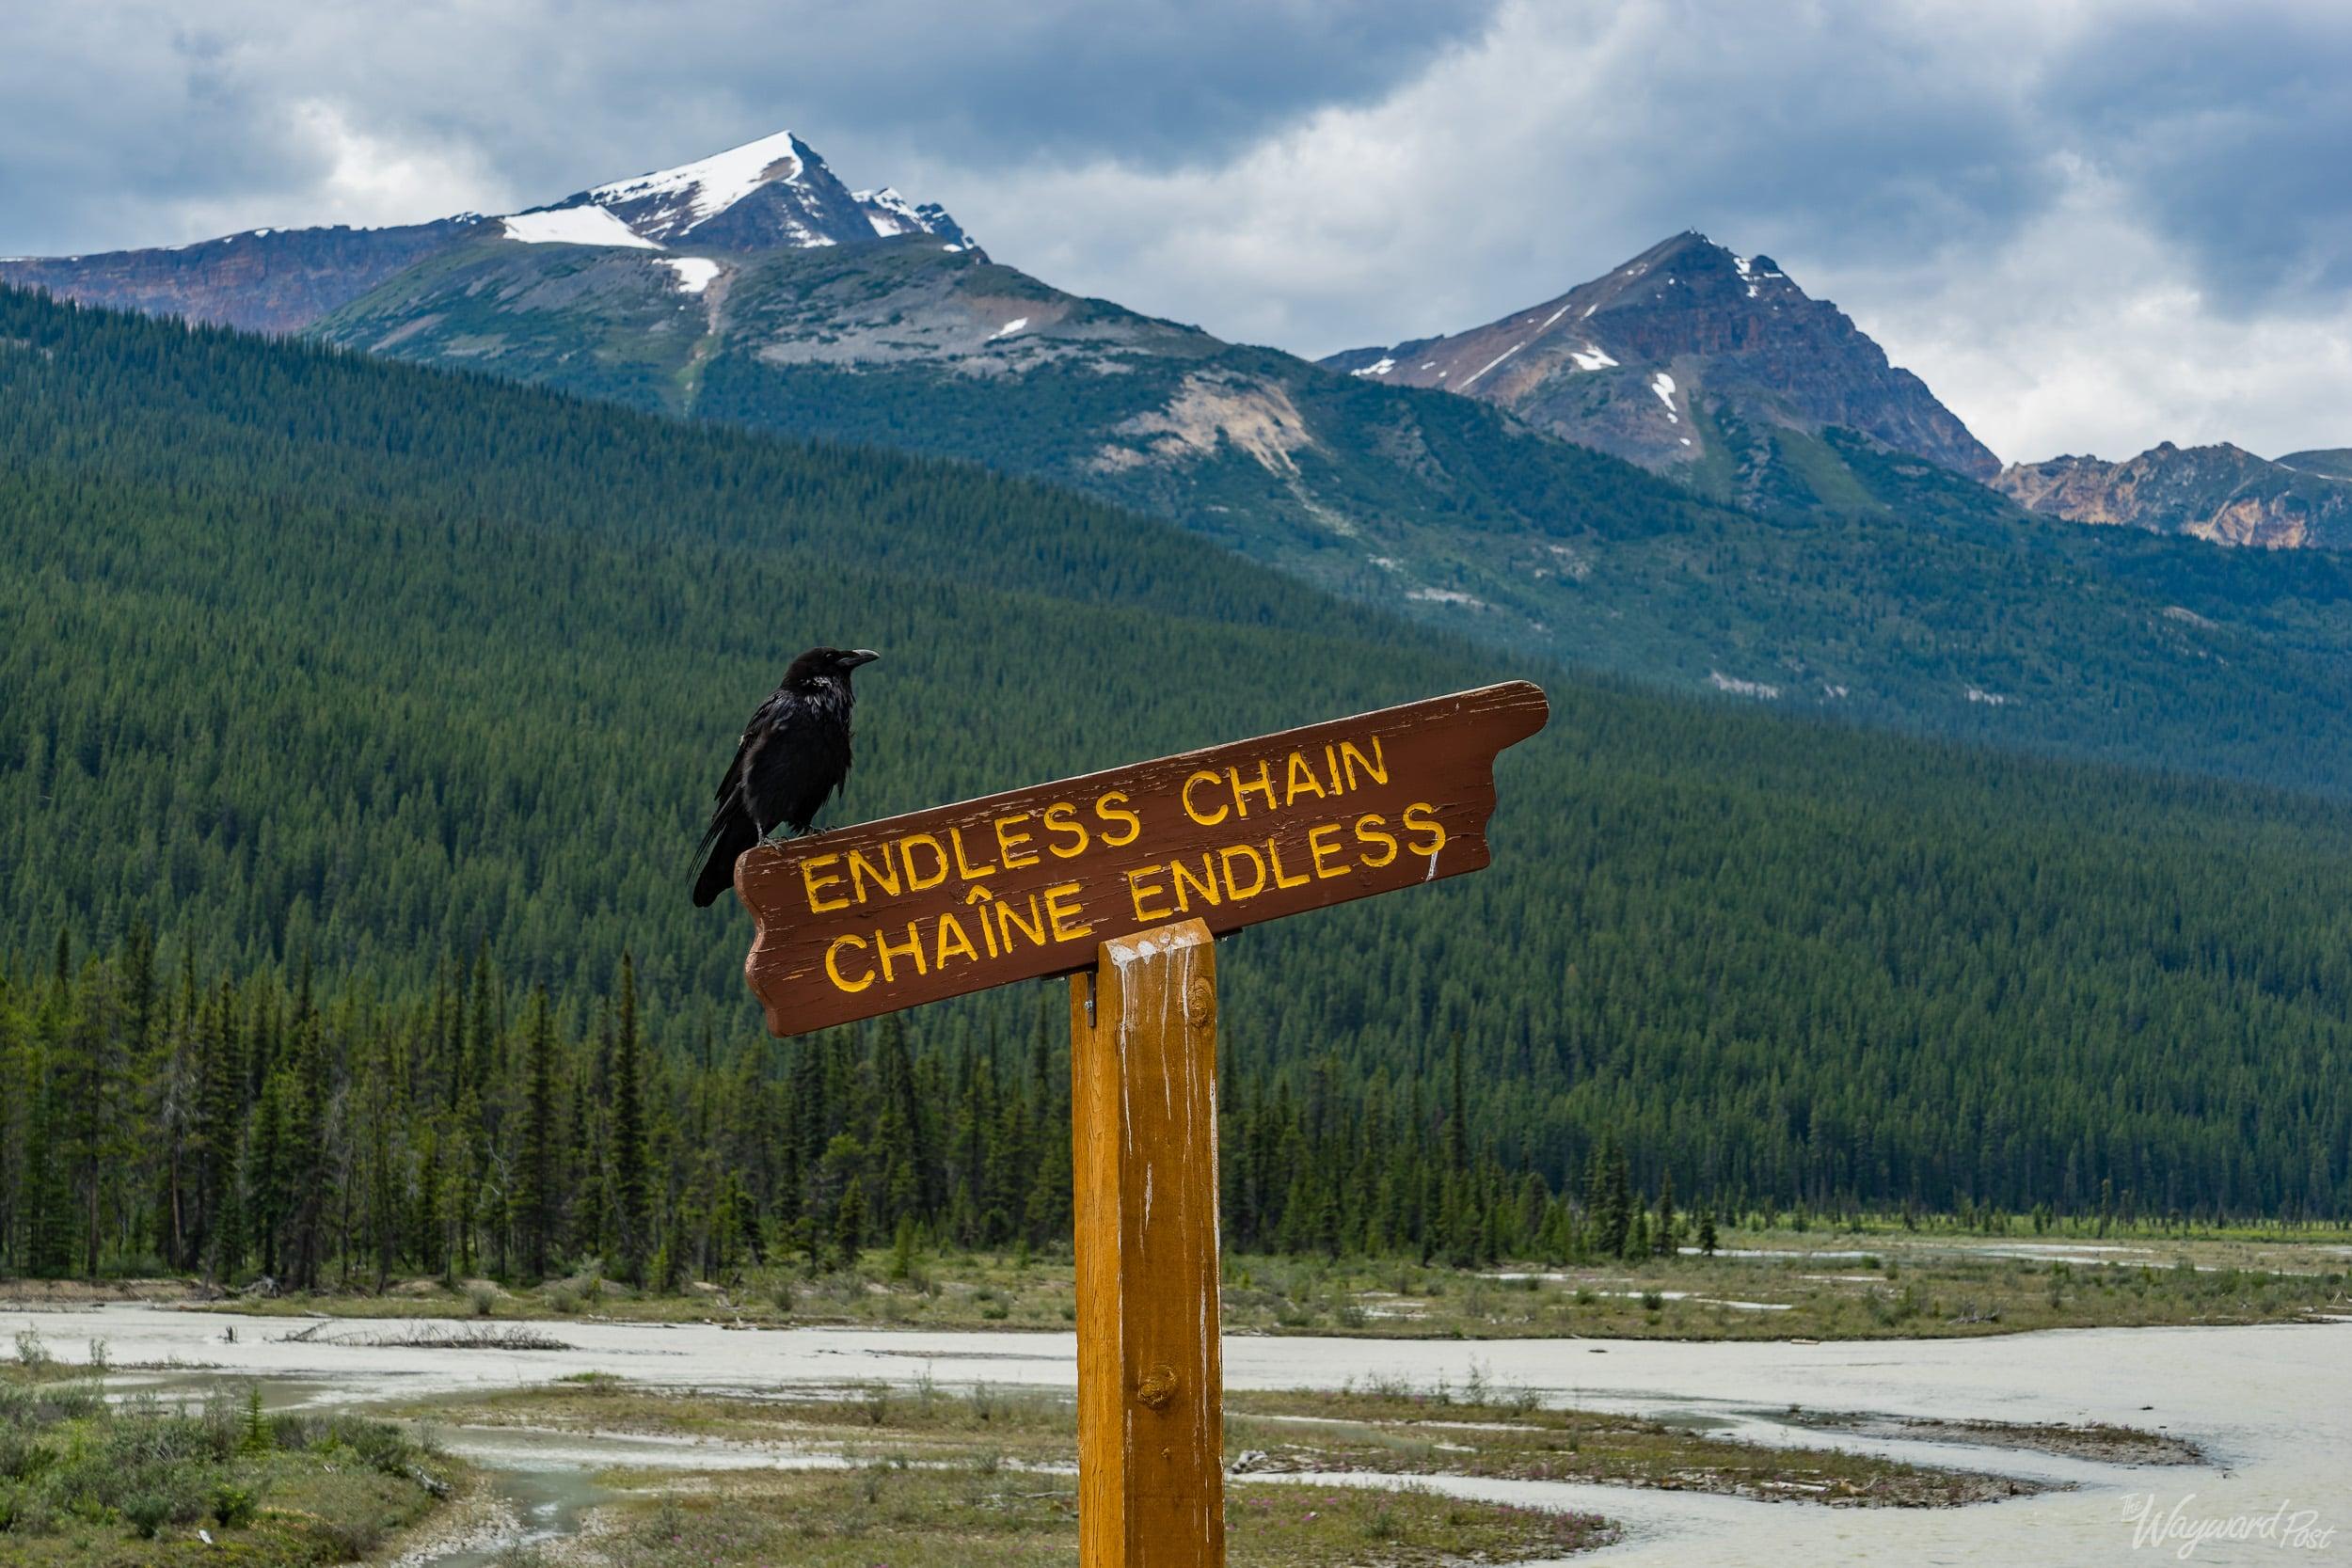 Endless Chain Mountains  Signpost- The Wayward Post - Photo Story - Jasper National Park, AB Canada